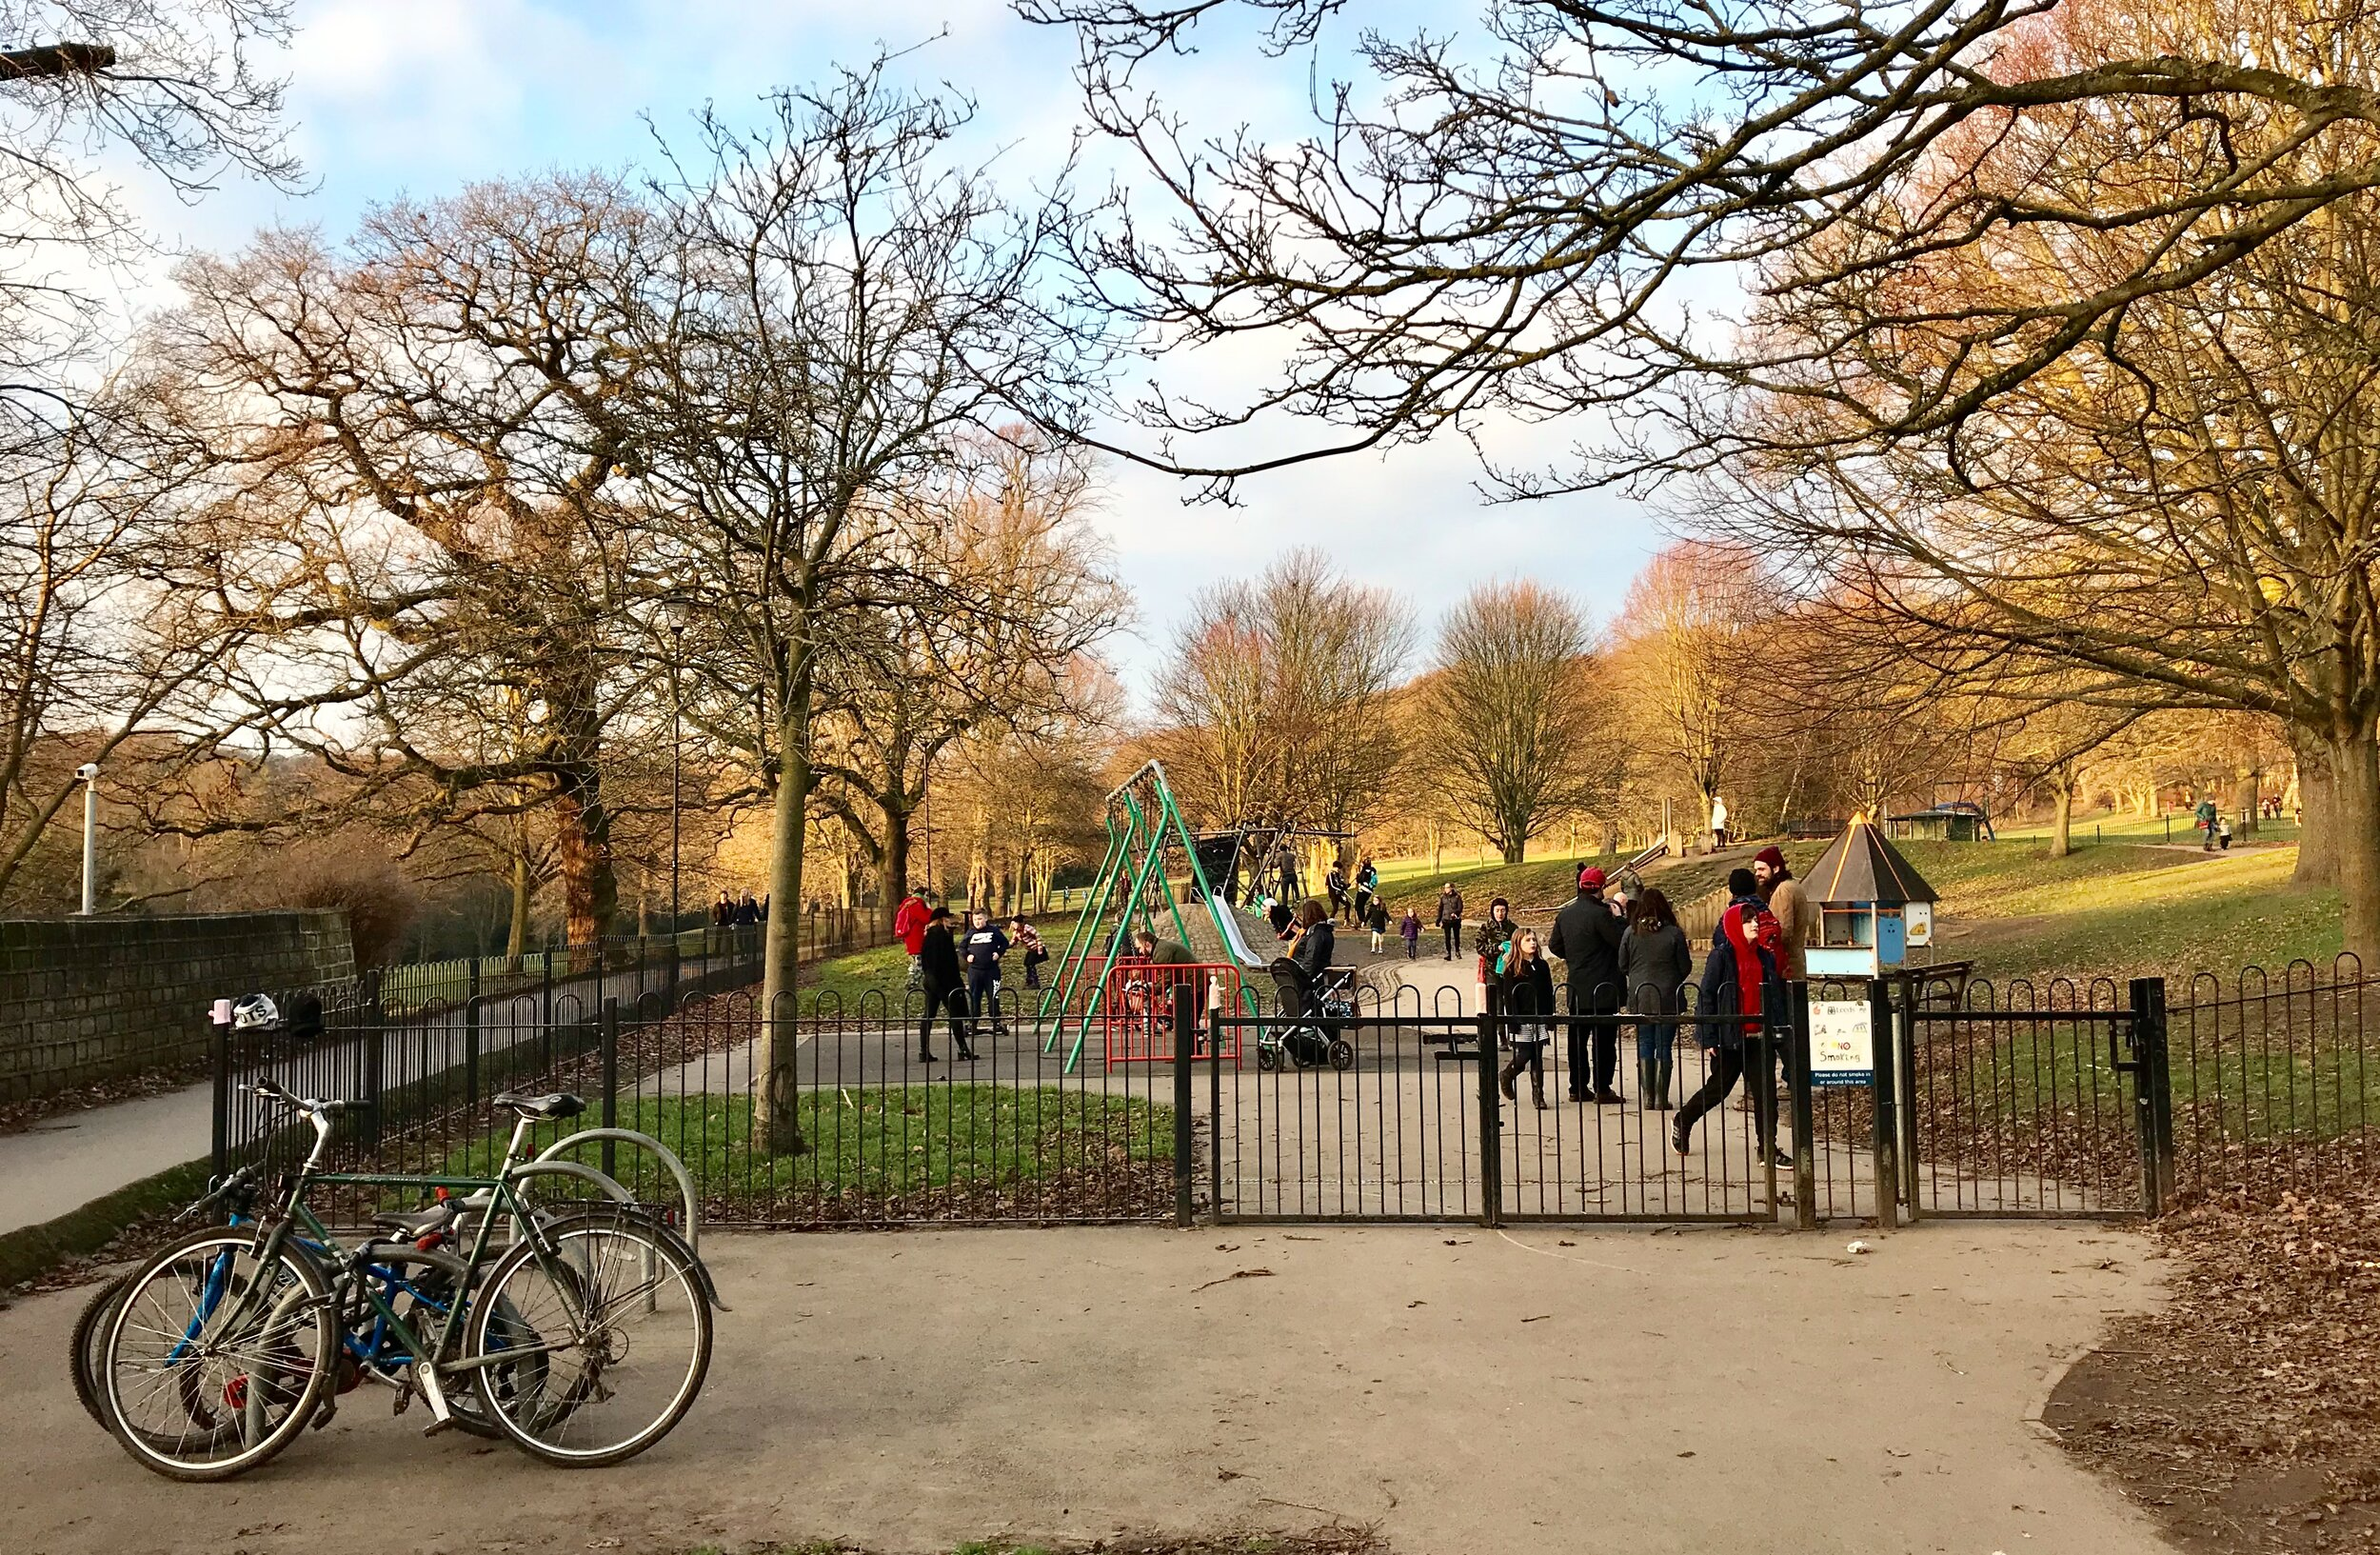 Playground, Meanwood Park © HP